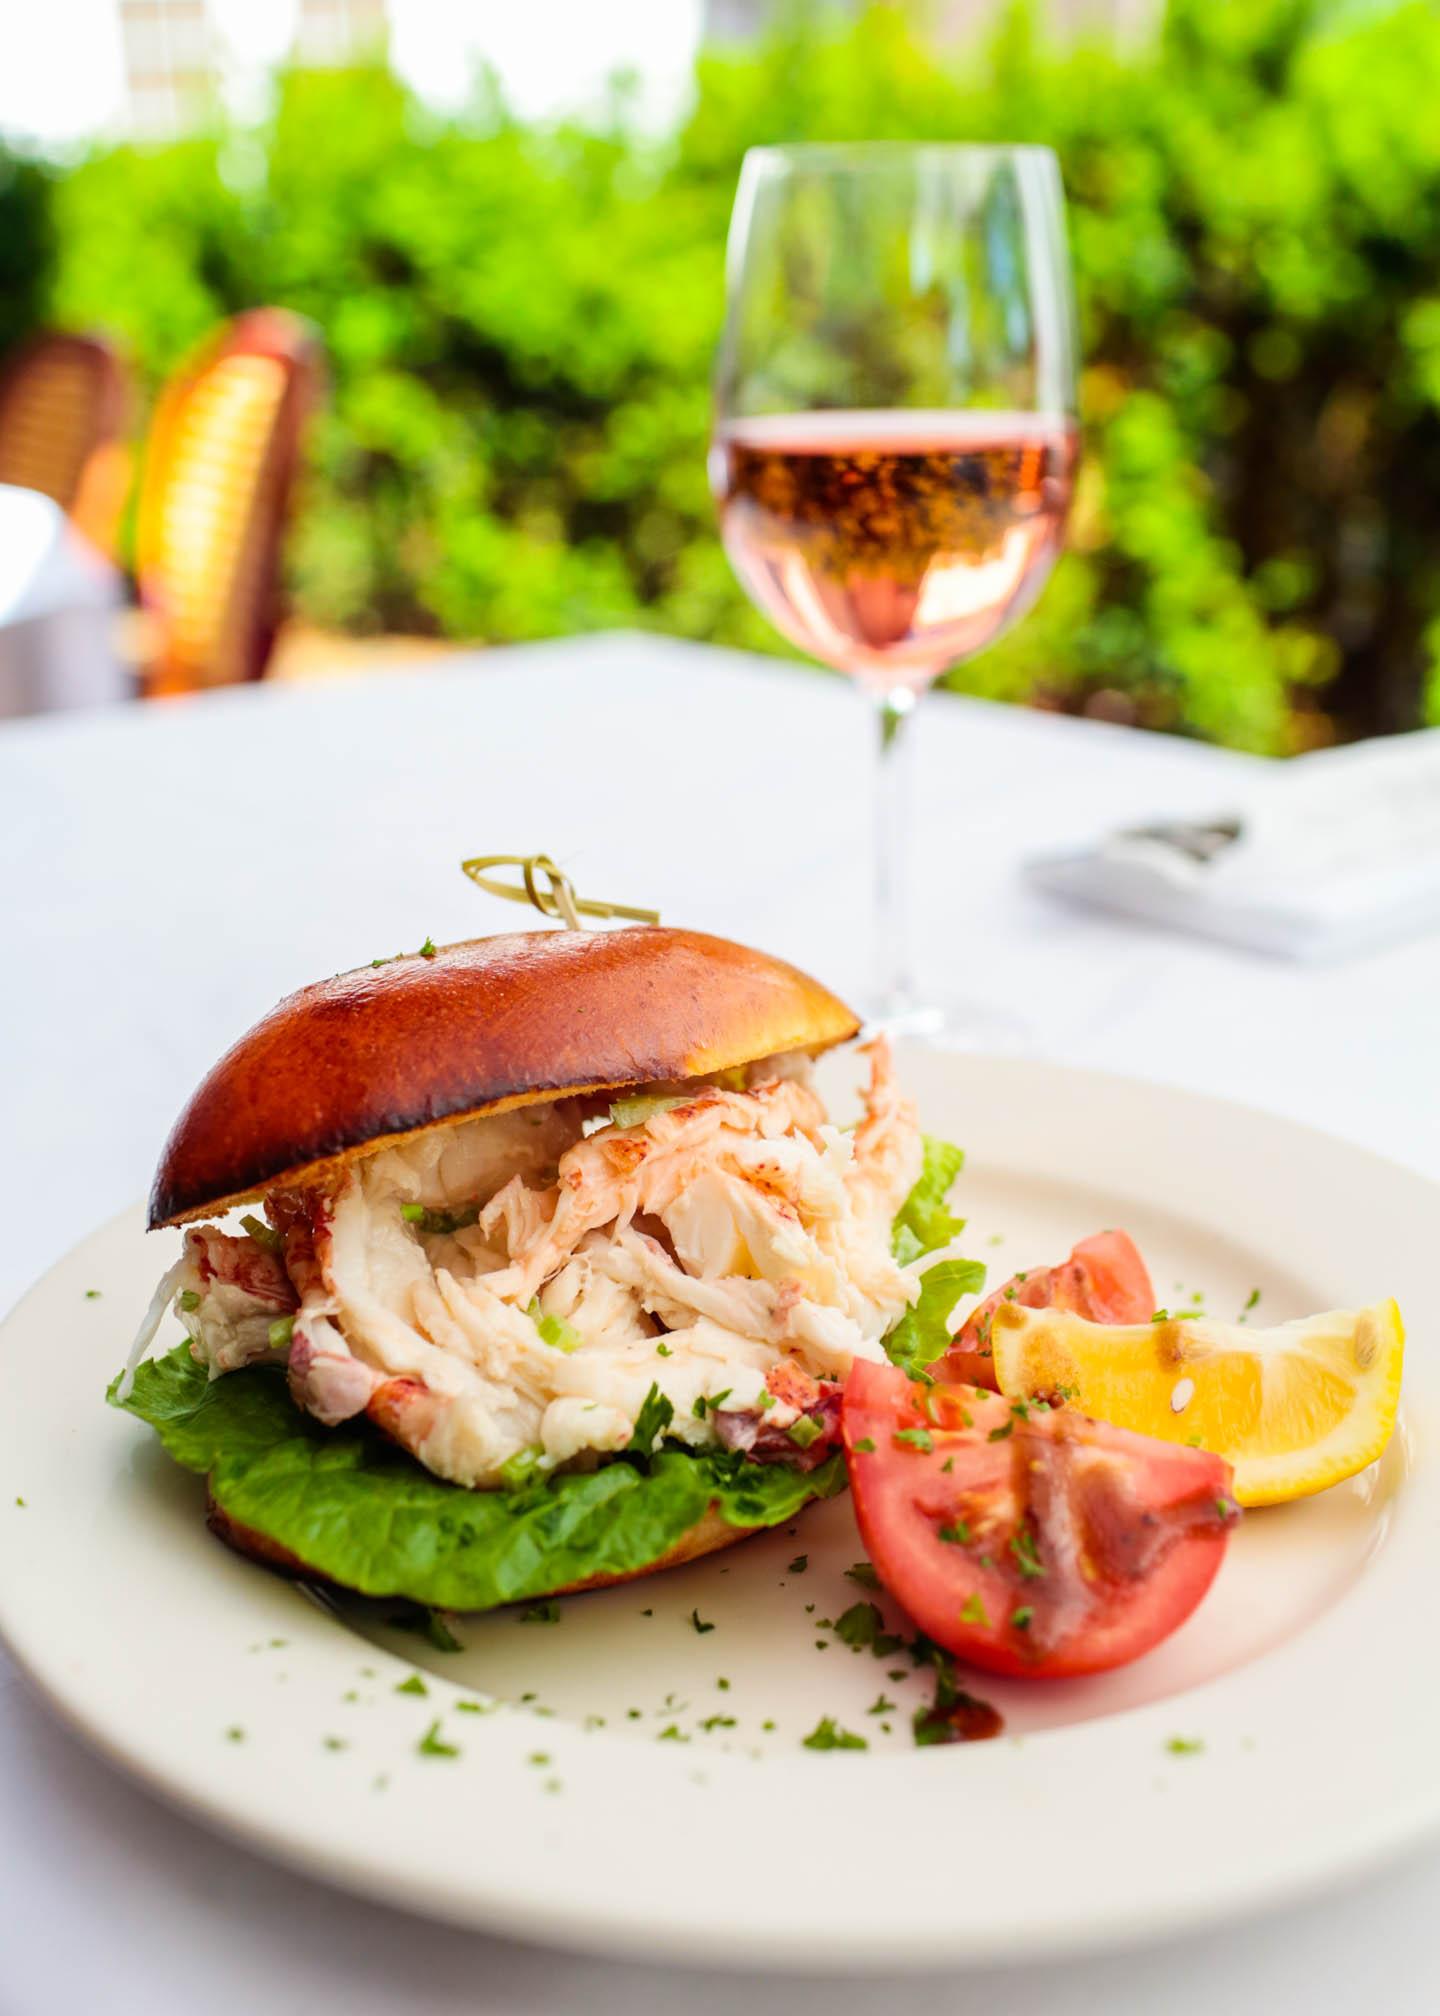 striffler-photography-lifestyle-food-Hamptons-2.jpg